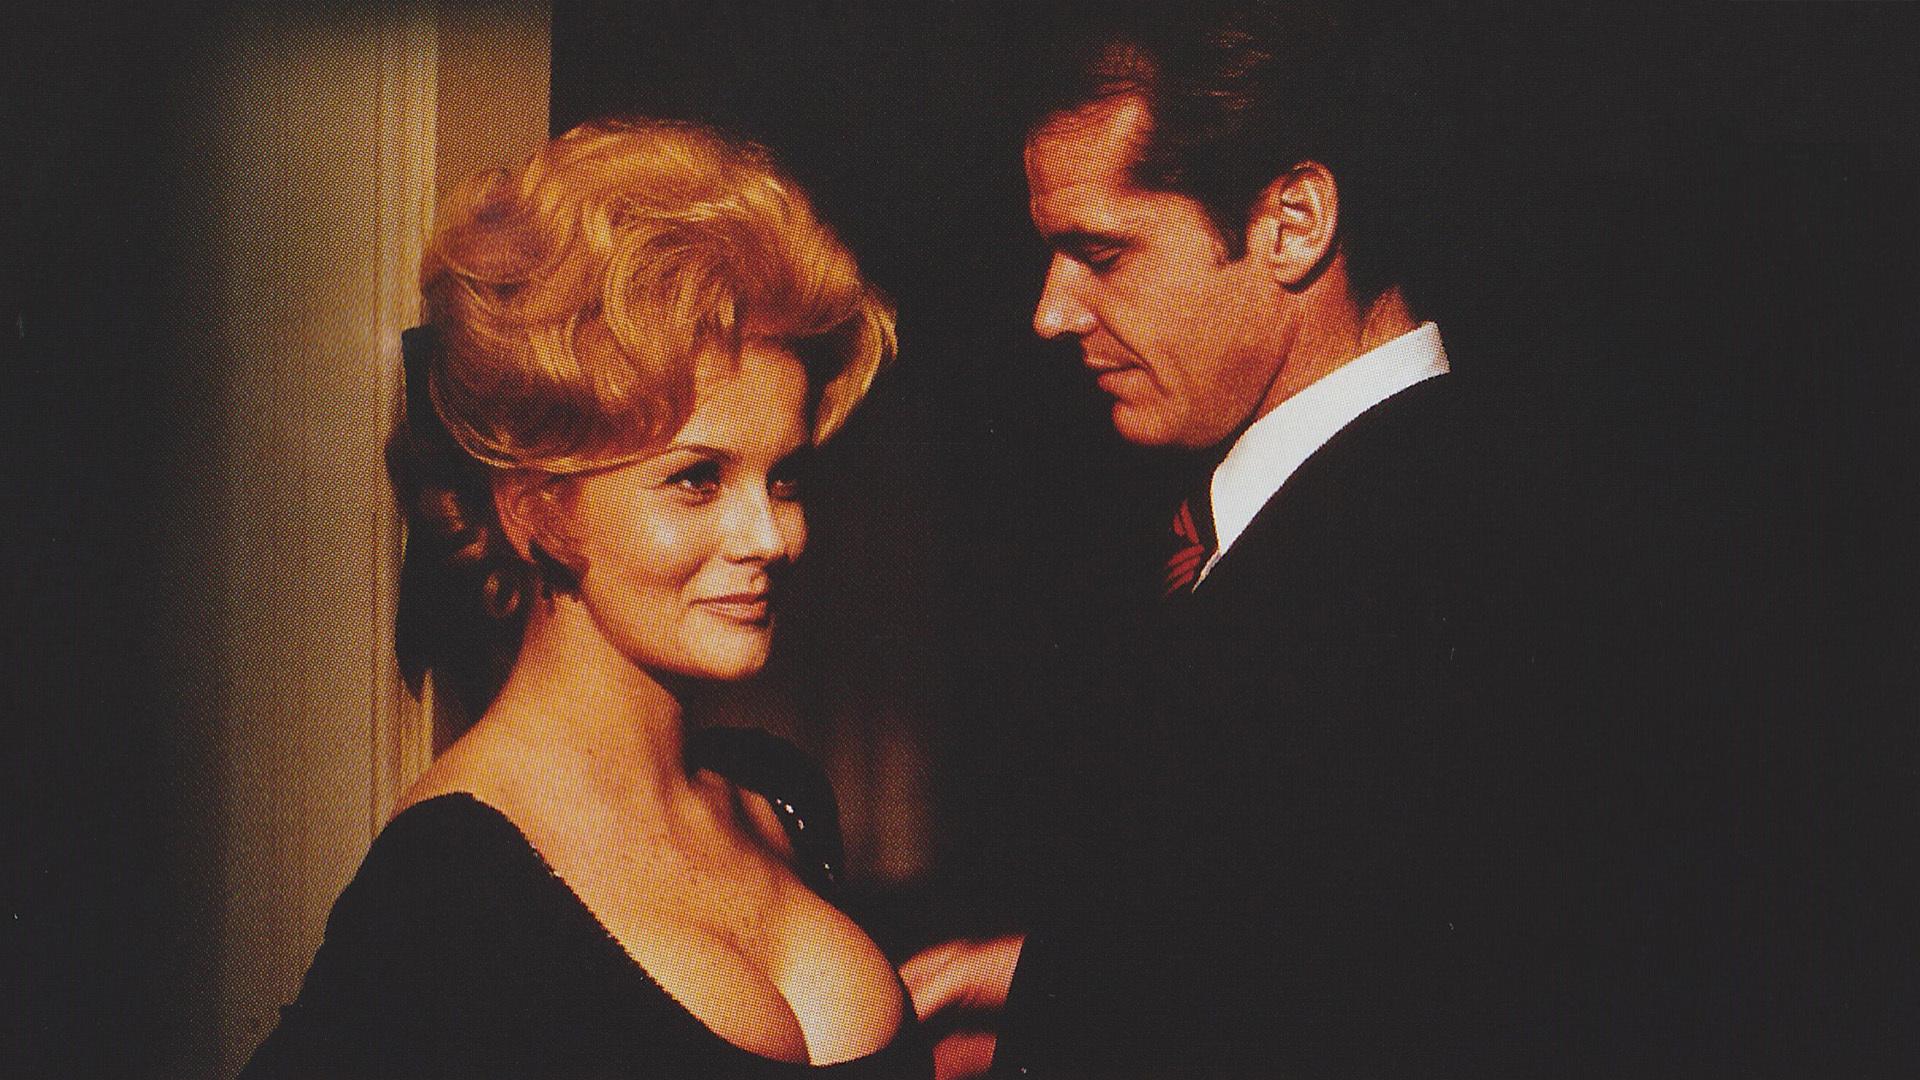 Conoscenza carnale: Jack Nicholson e Ann Margret